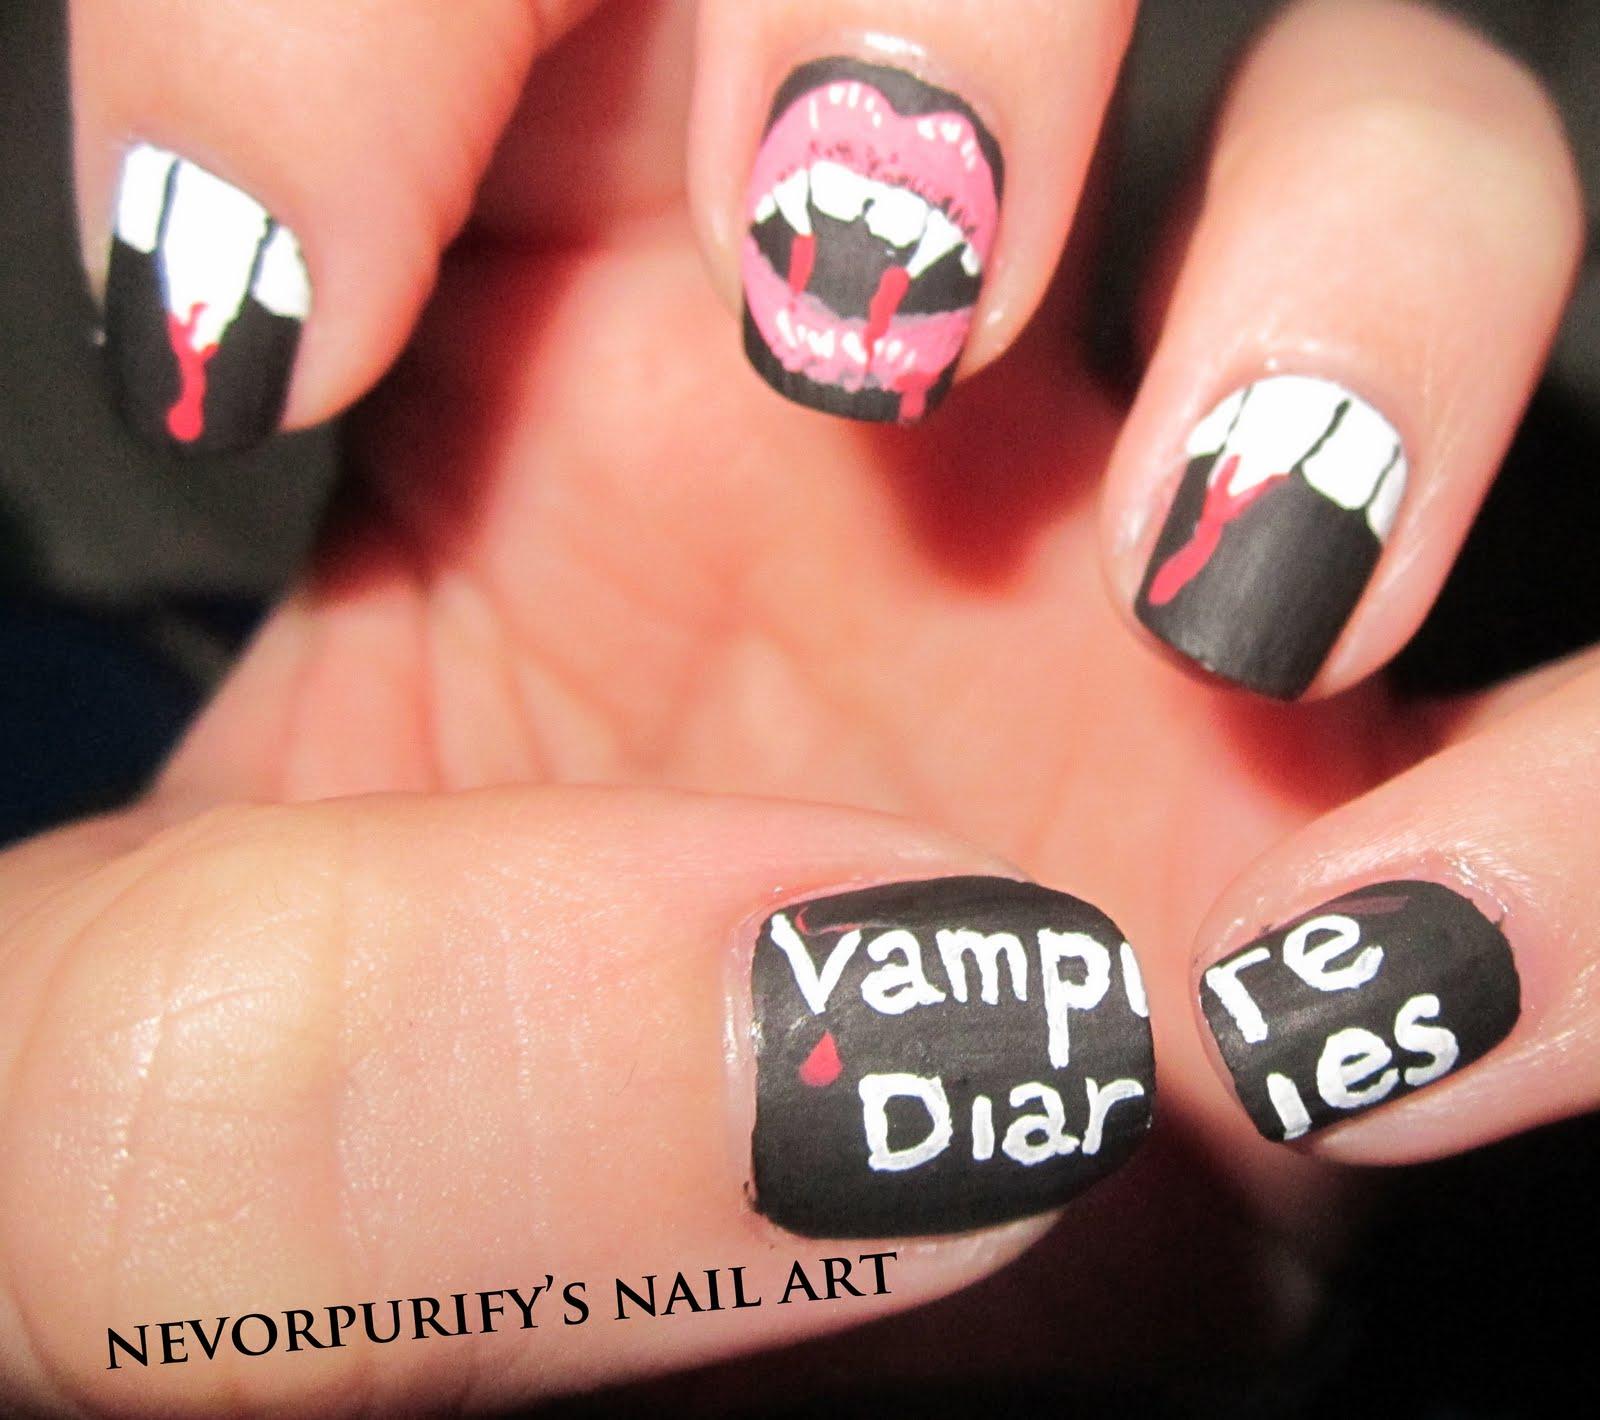 Vampire Nail Polish: Nevorpurify's Nail Art